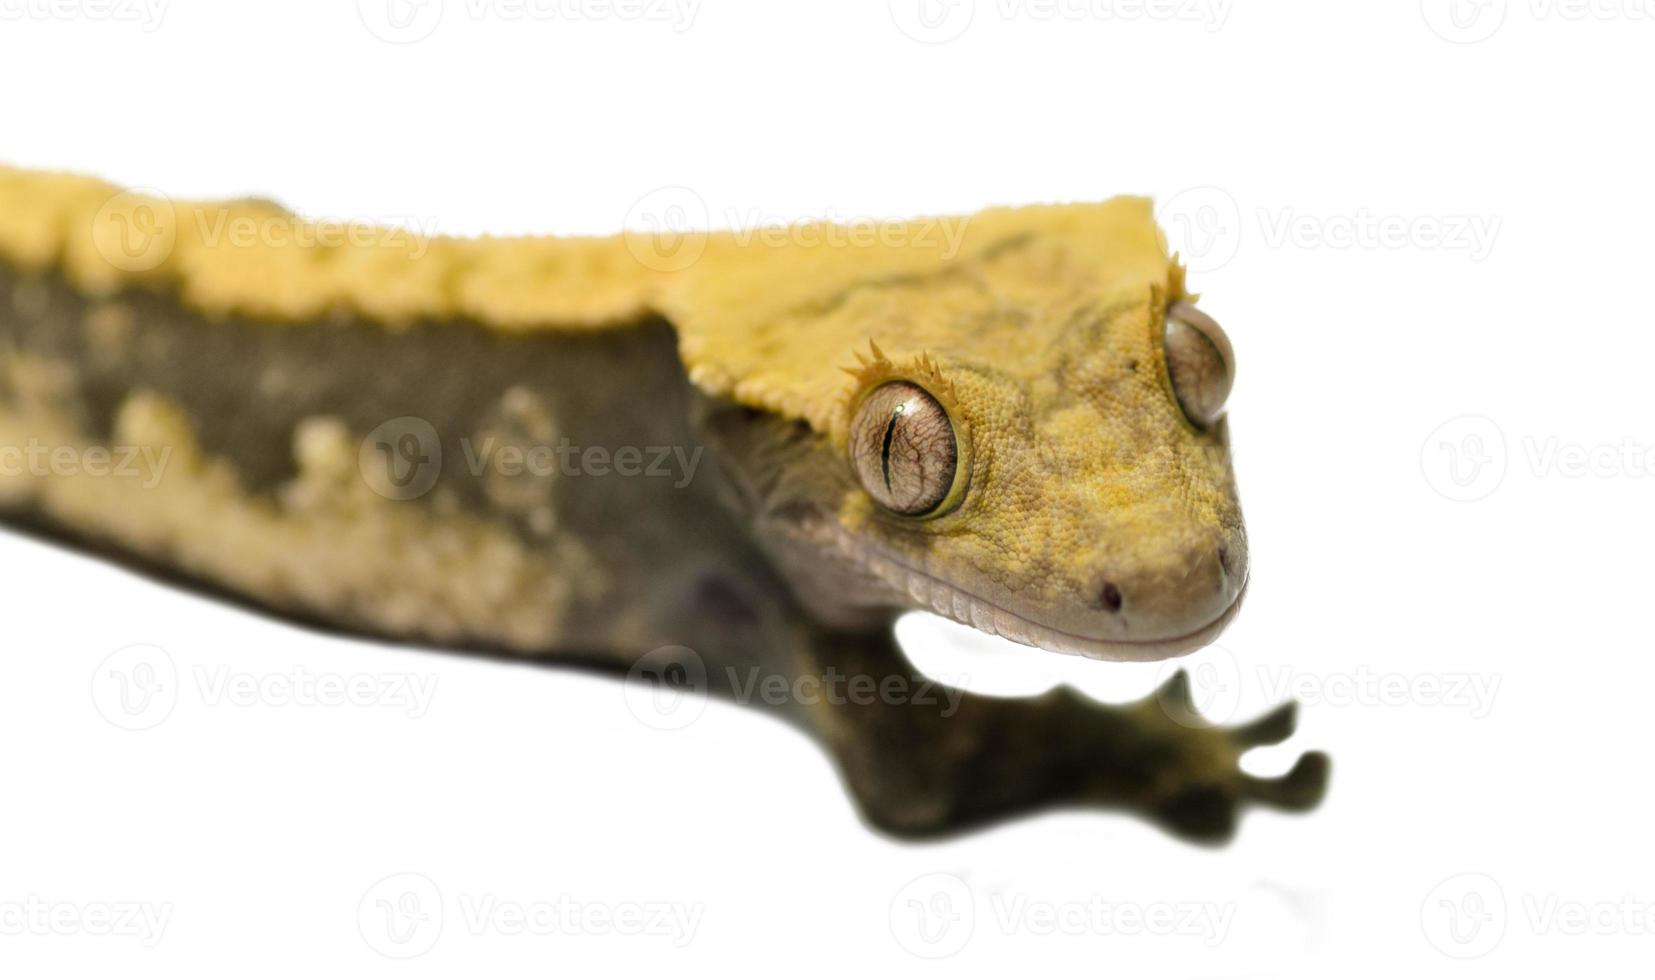 Lagarto crestado gecko aislado sobre fondo blanco. foto